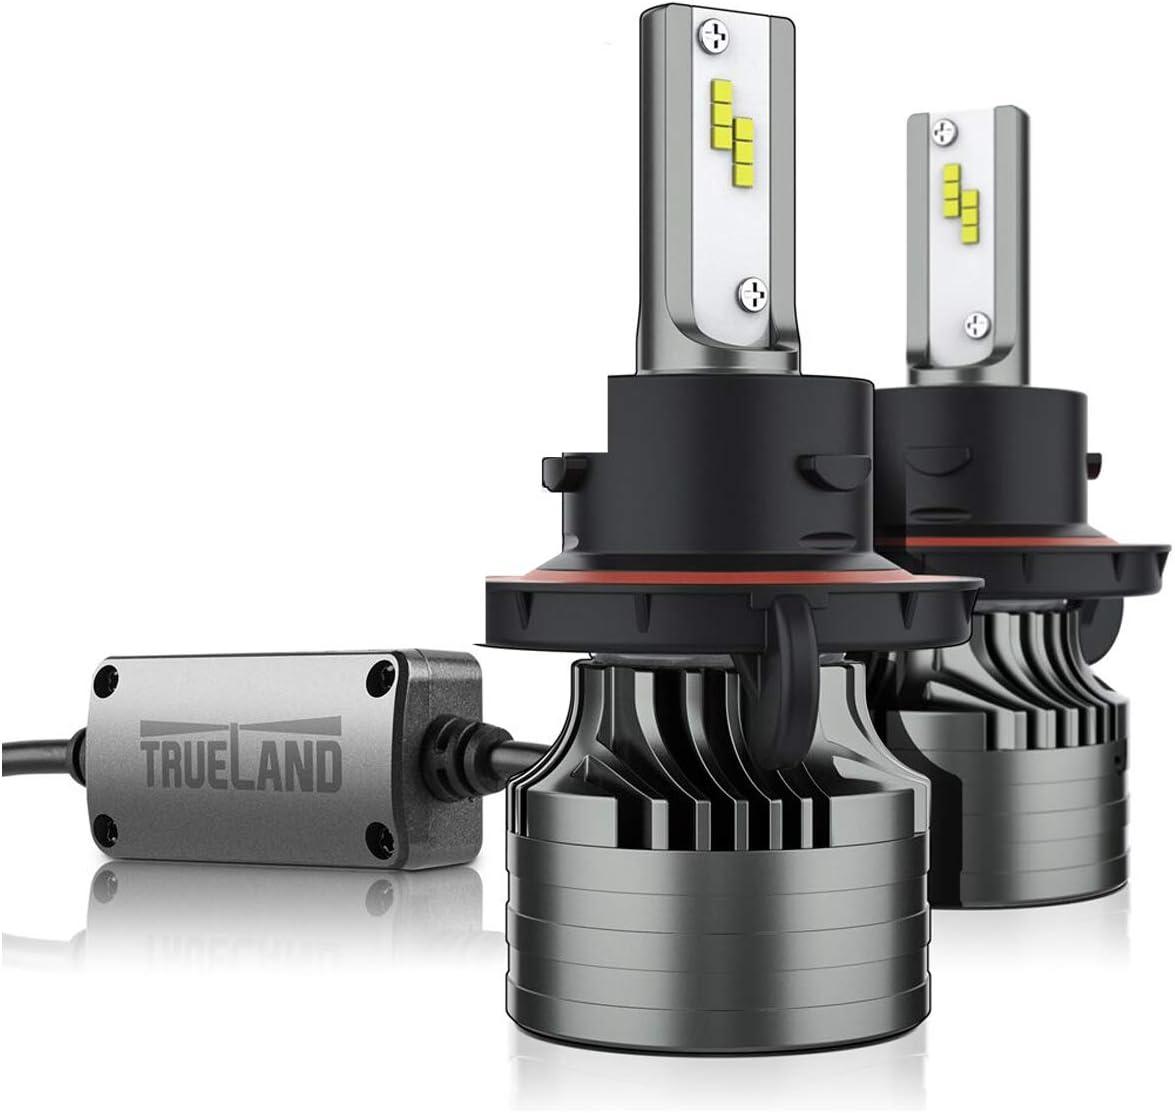 H13/9008 LED Headlight Bulbs A4 Series F250/ F150 LED Headlight Conversion Kit 10000LM Super Bright 6000K 9008 LED Headlamp Hi/Lo Beam Anti-Flickering Canbus Decoder Top CSP IP67 Silent Fans